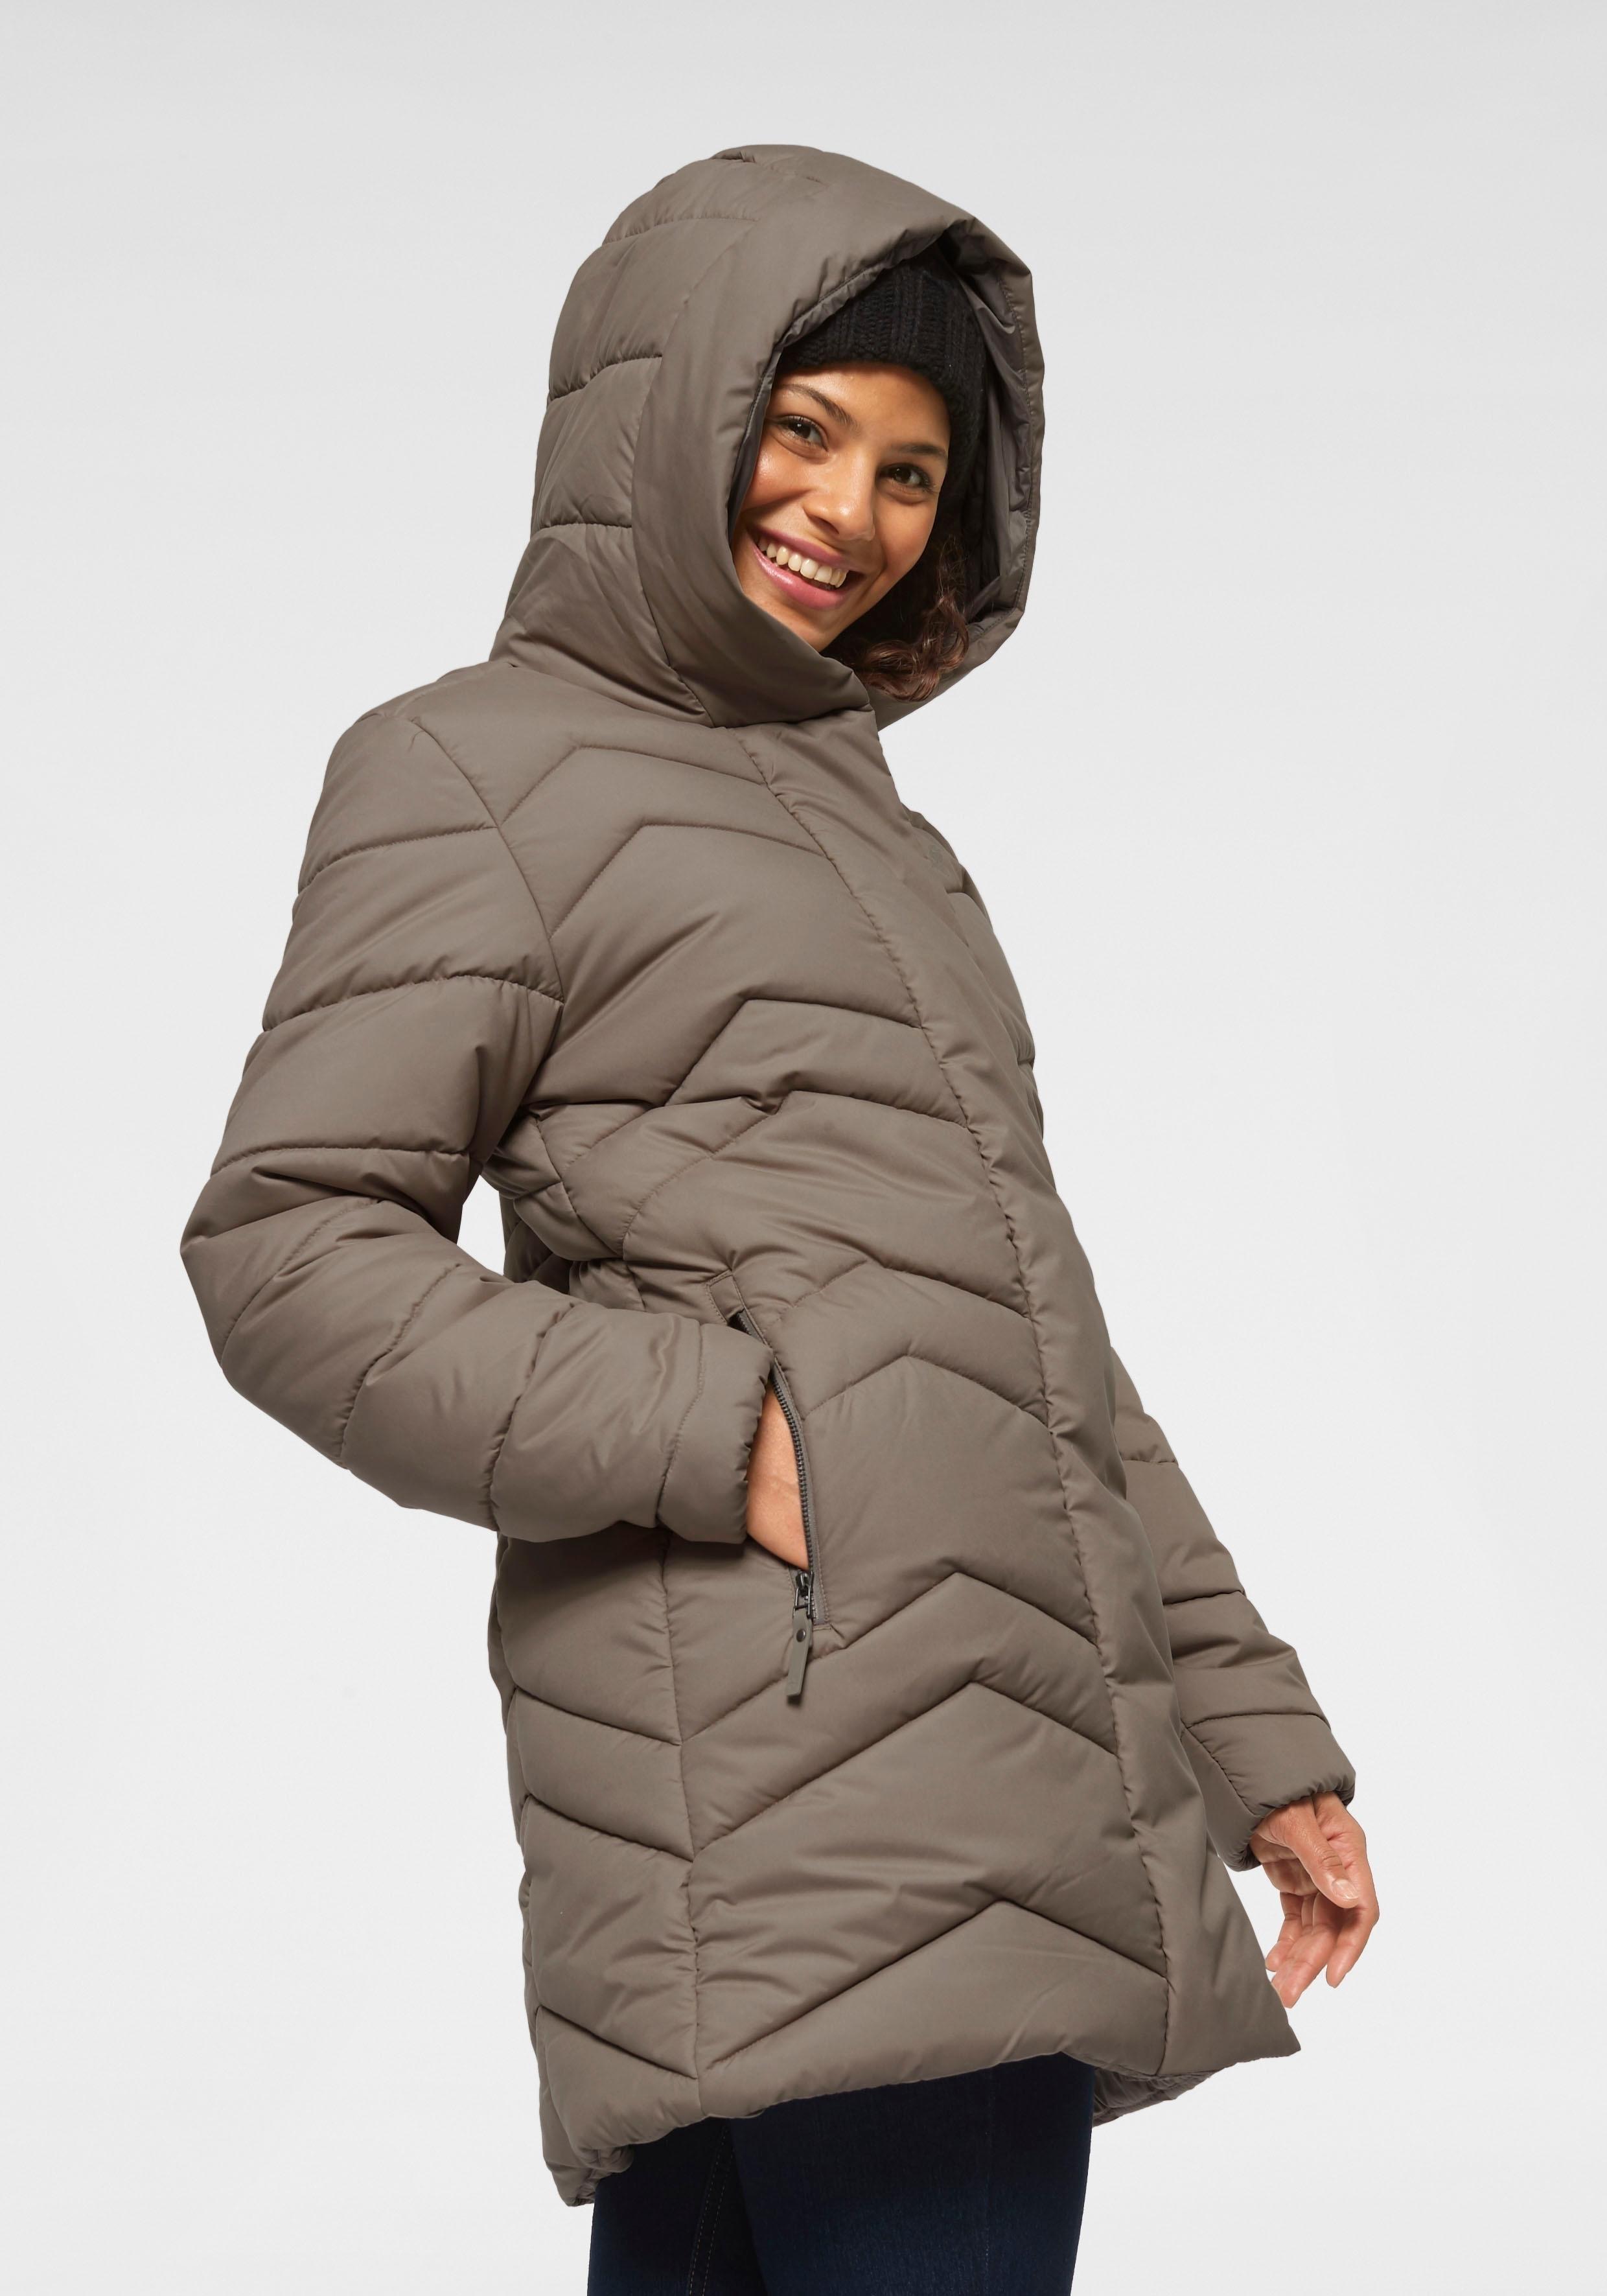 Jack Wolfskin doorgestikte jas nu online kopen bij OTTO